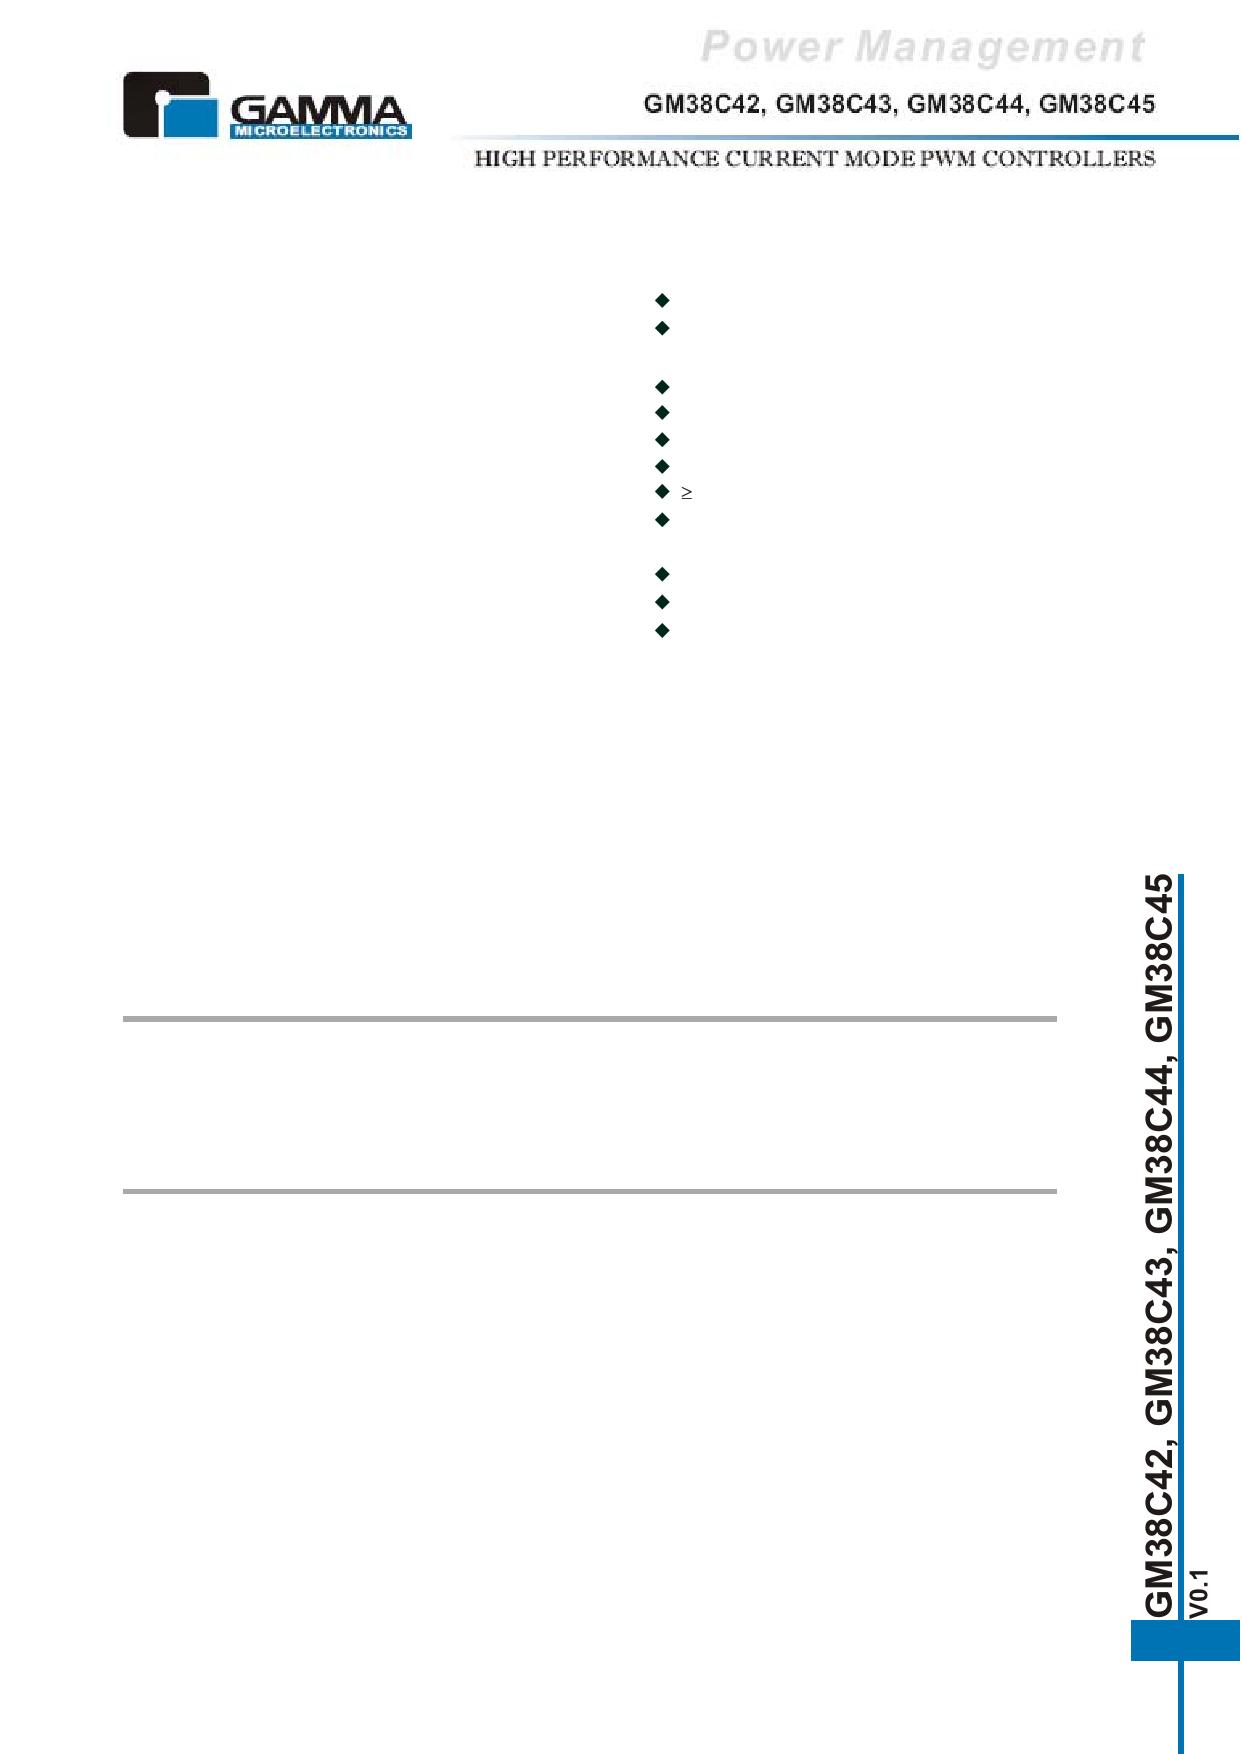 GM38C45 دیتاشیت PDF